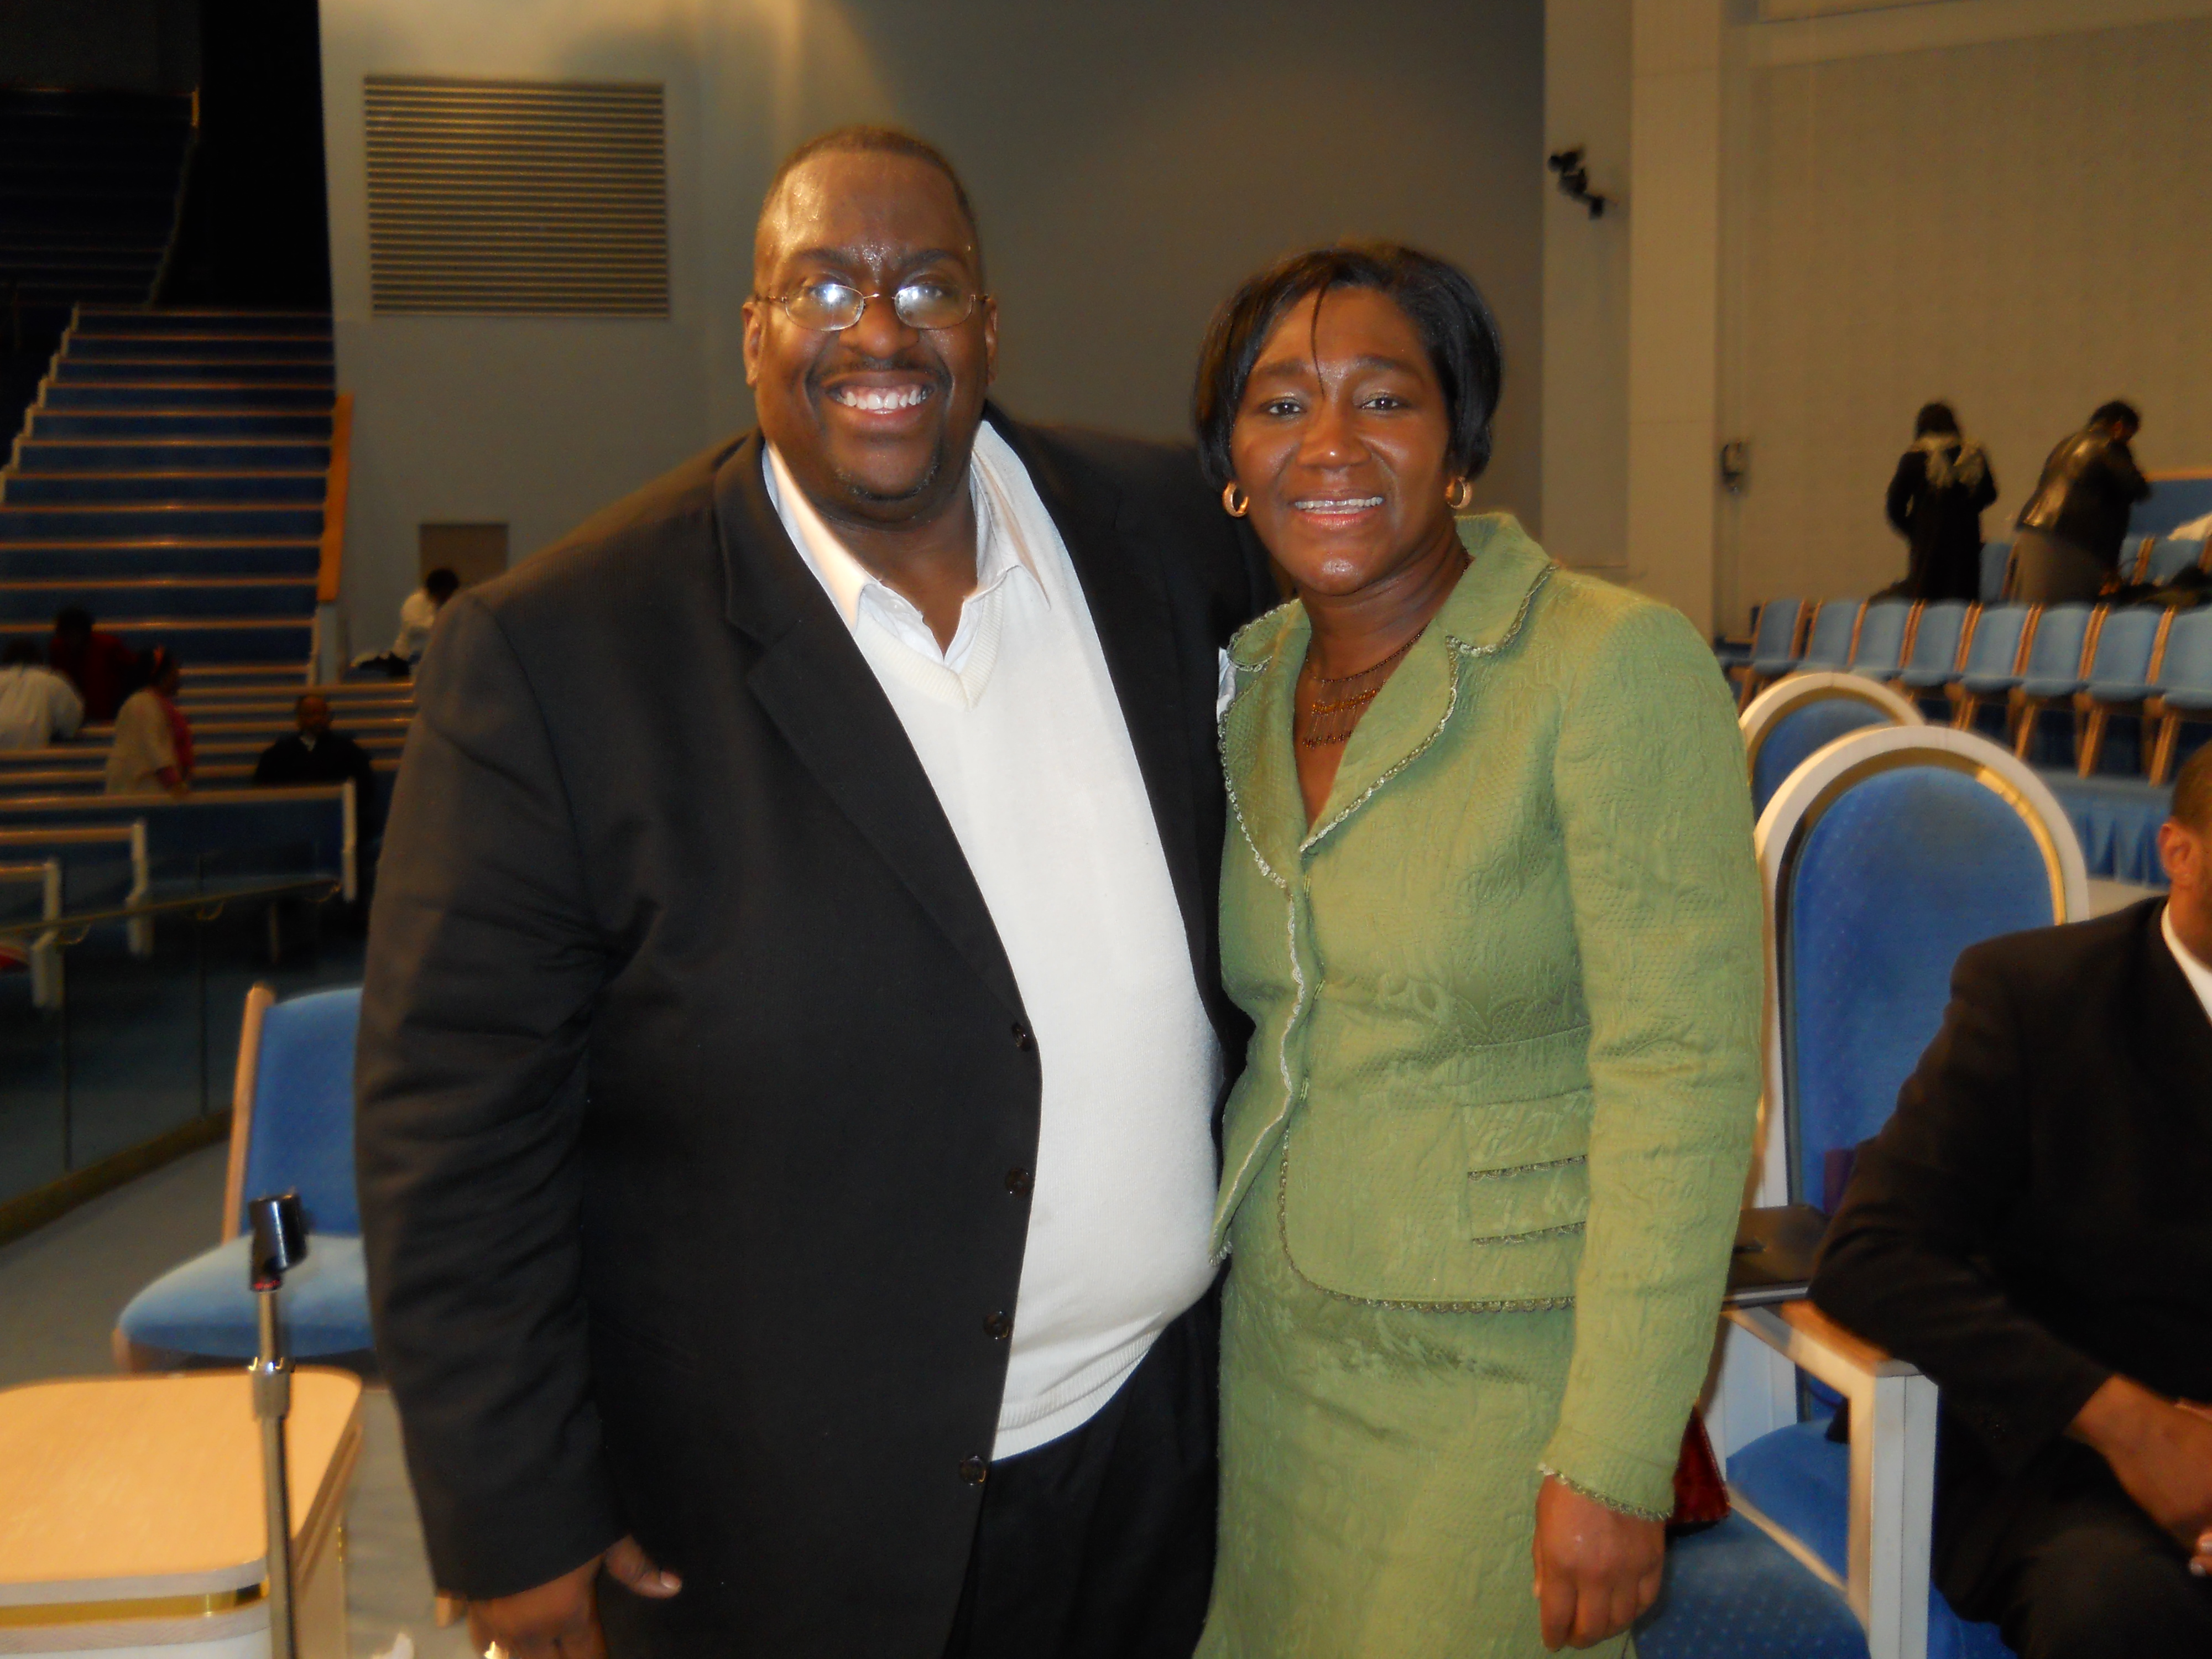 pastor joel peebles weight loss